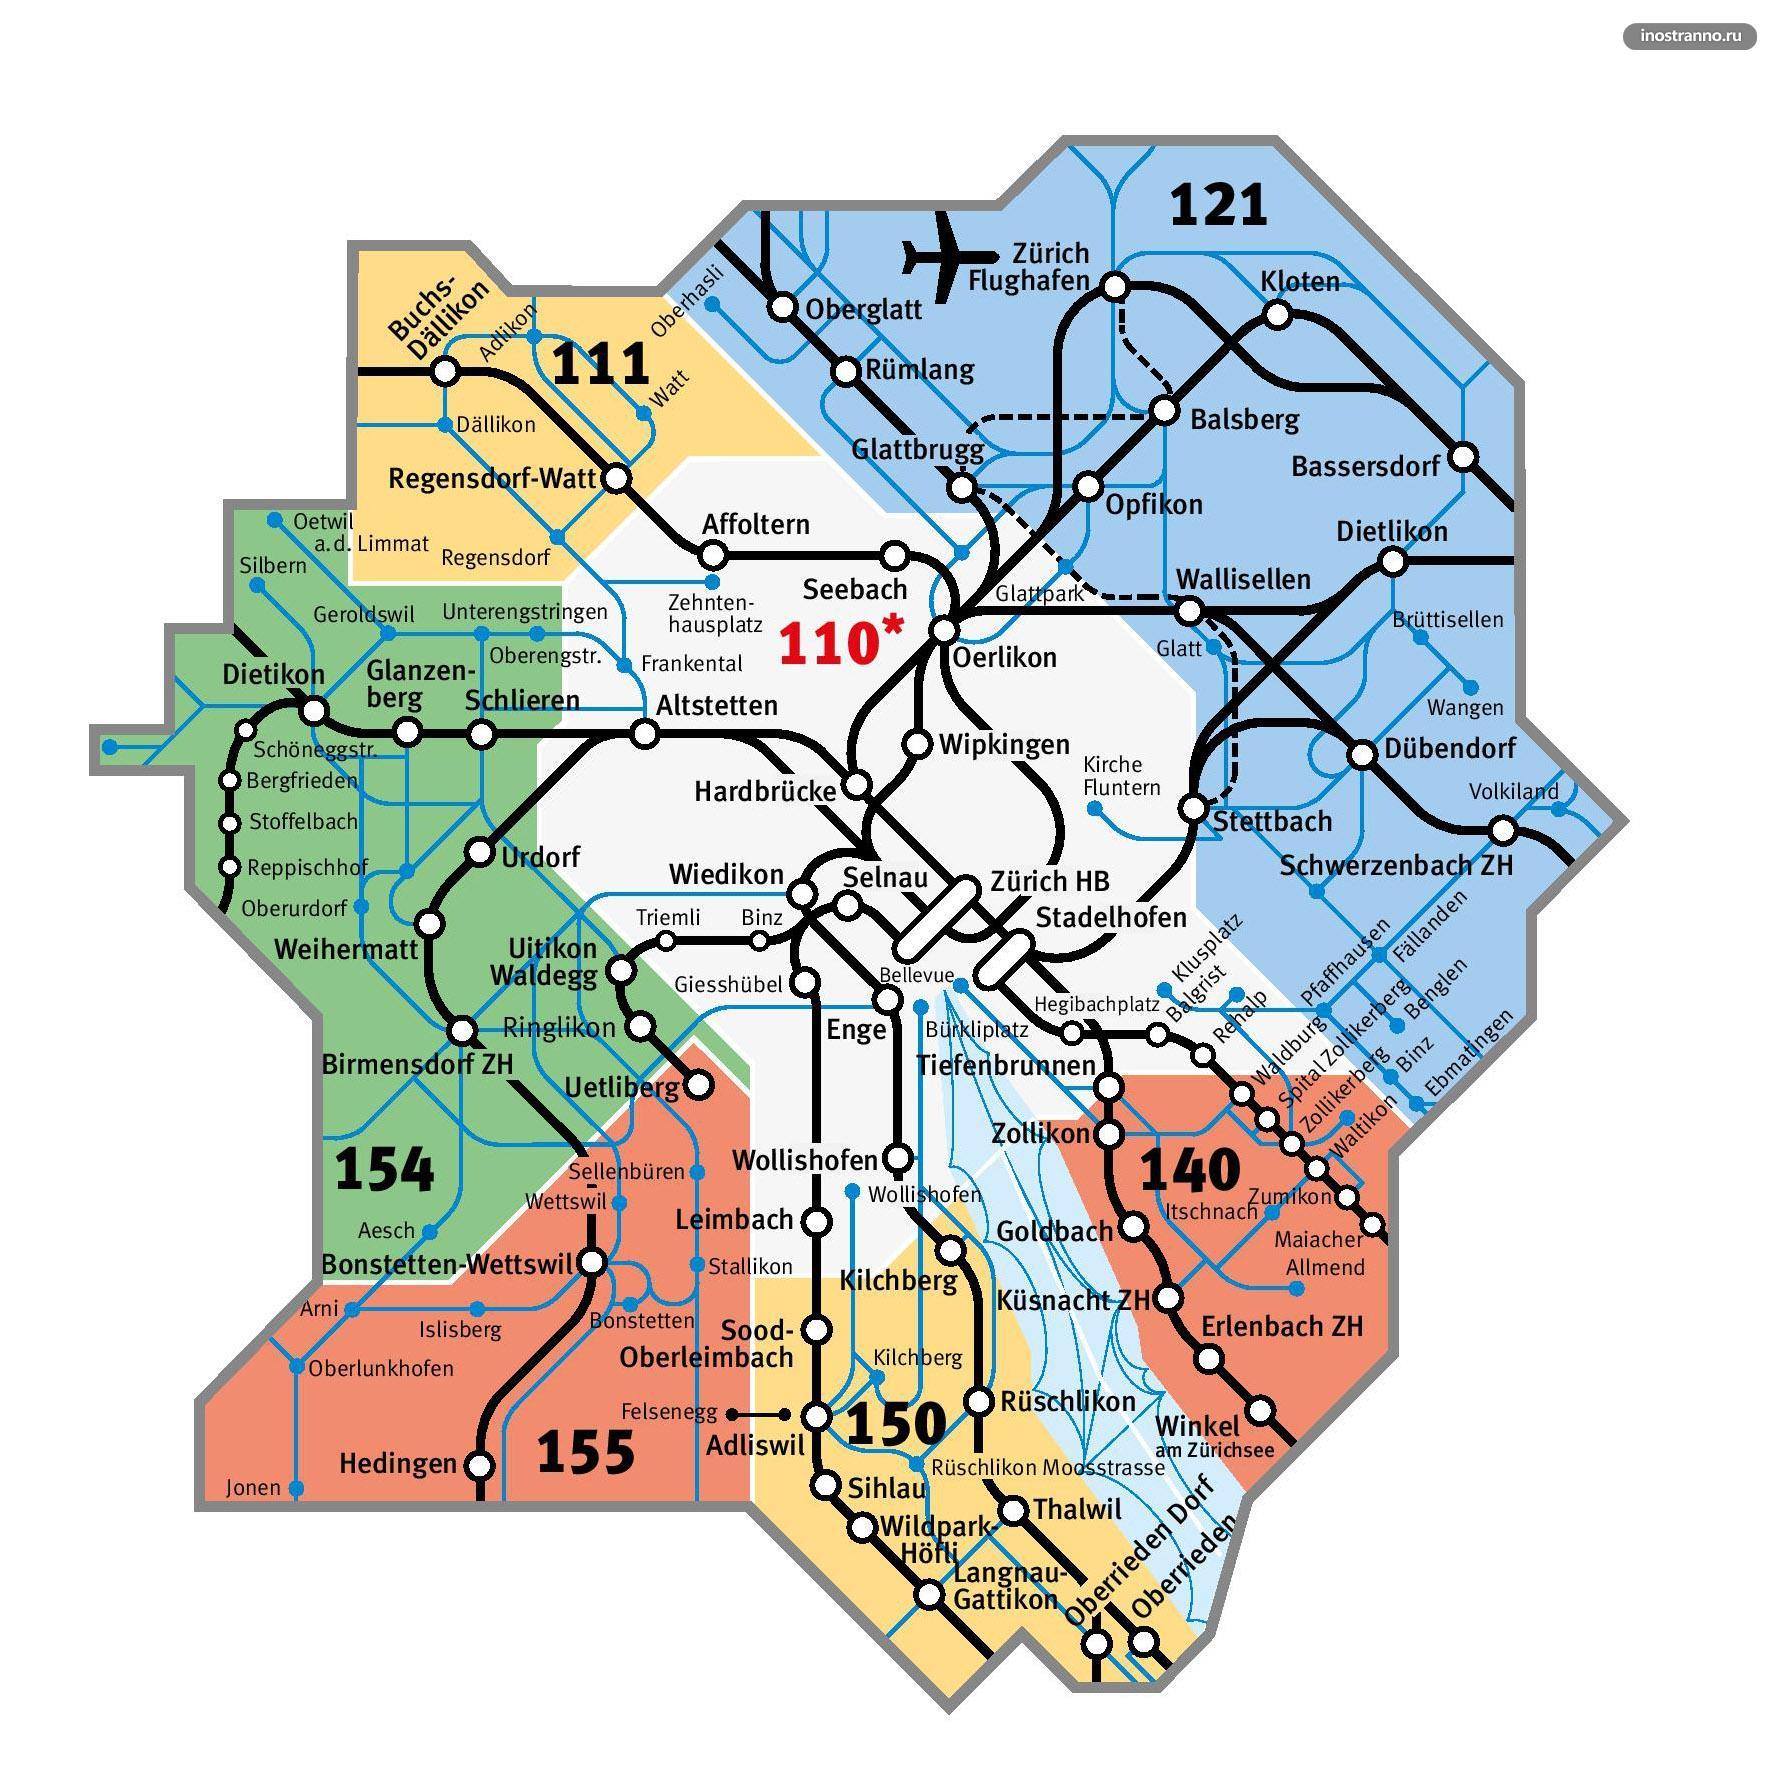 Карта тарифных зон Цюриха